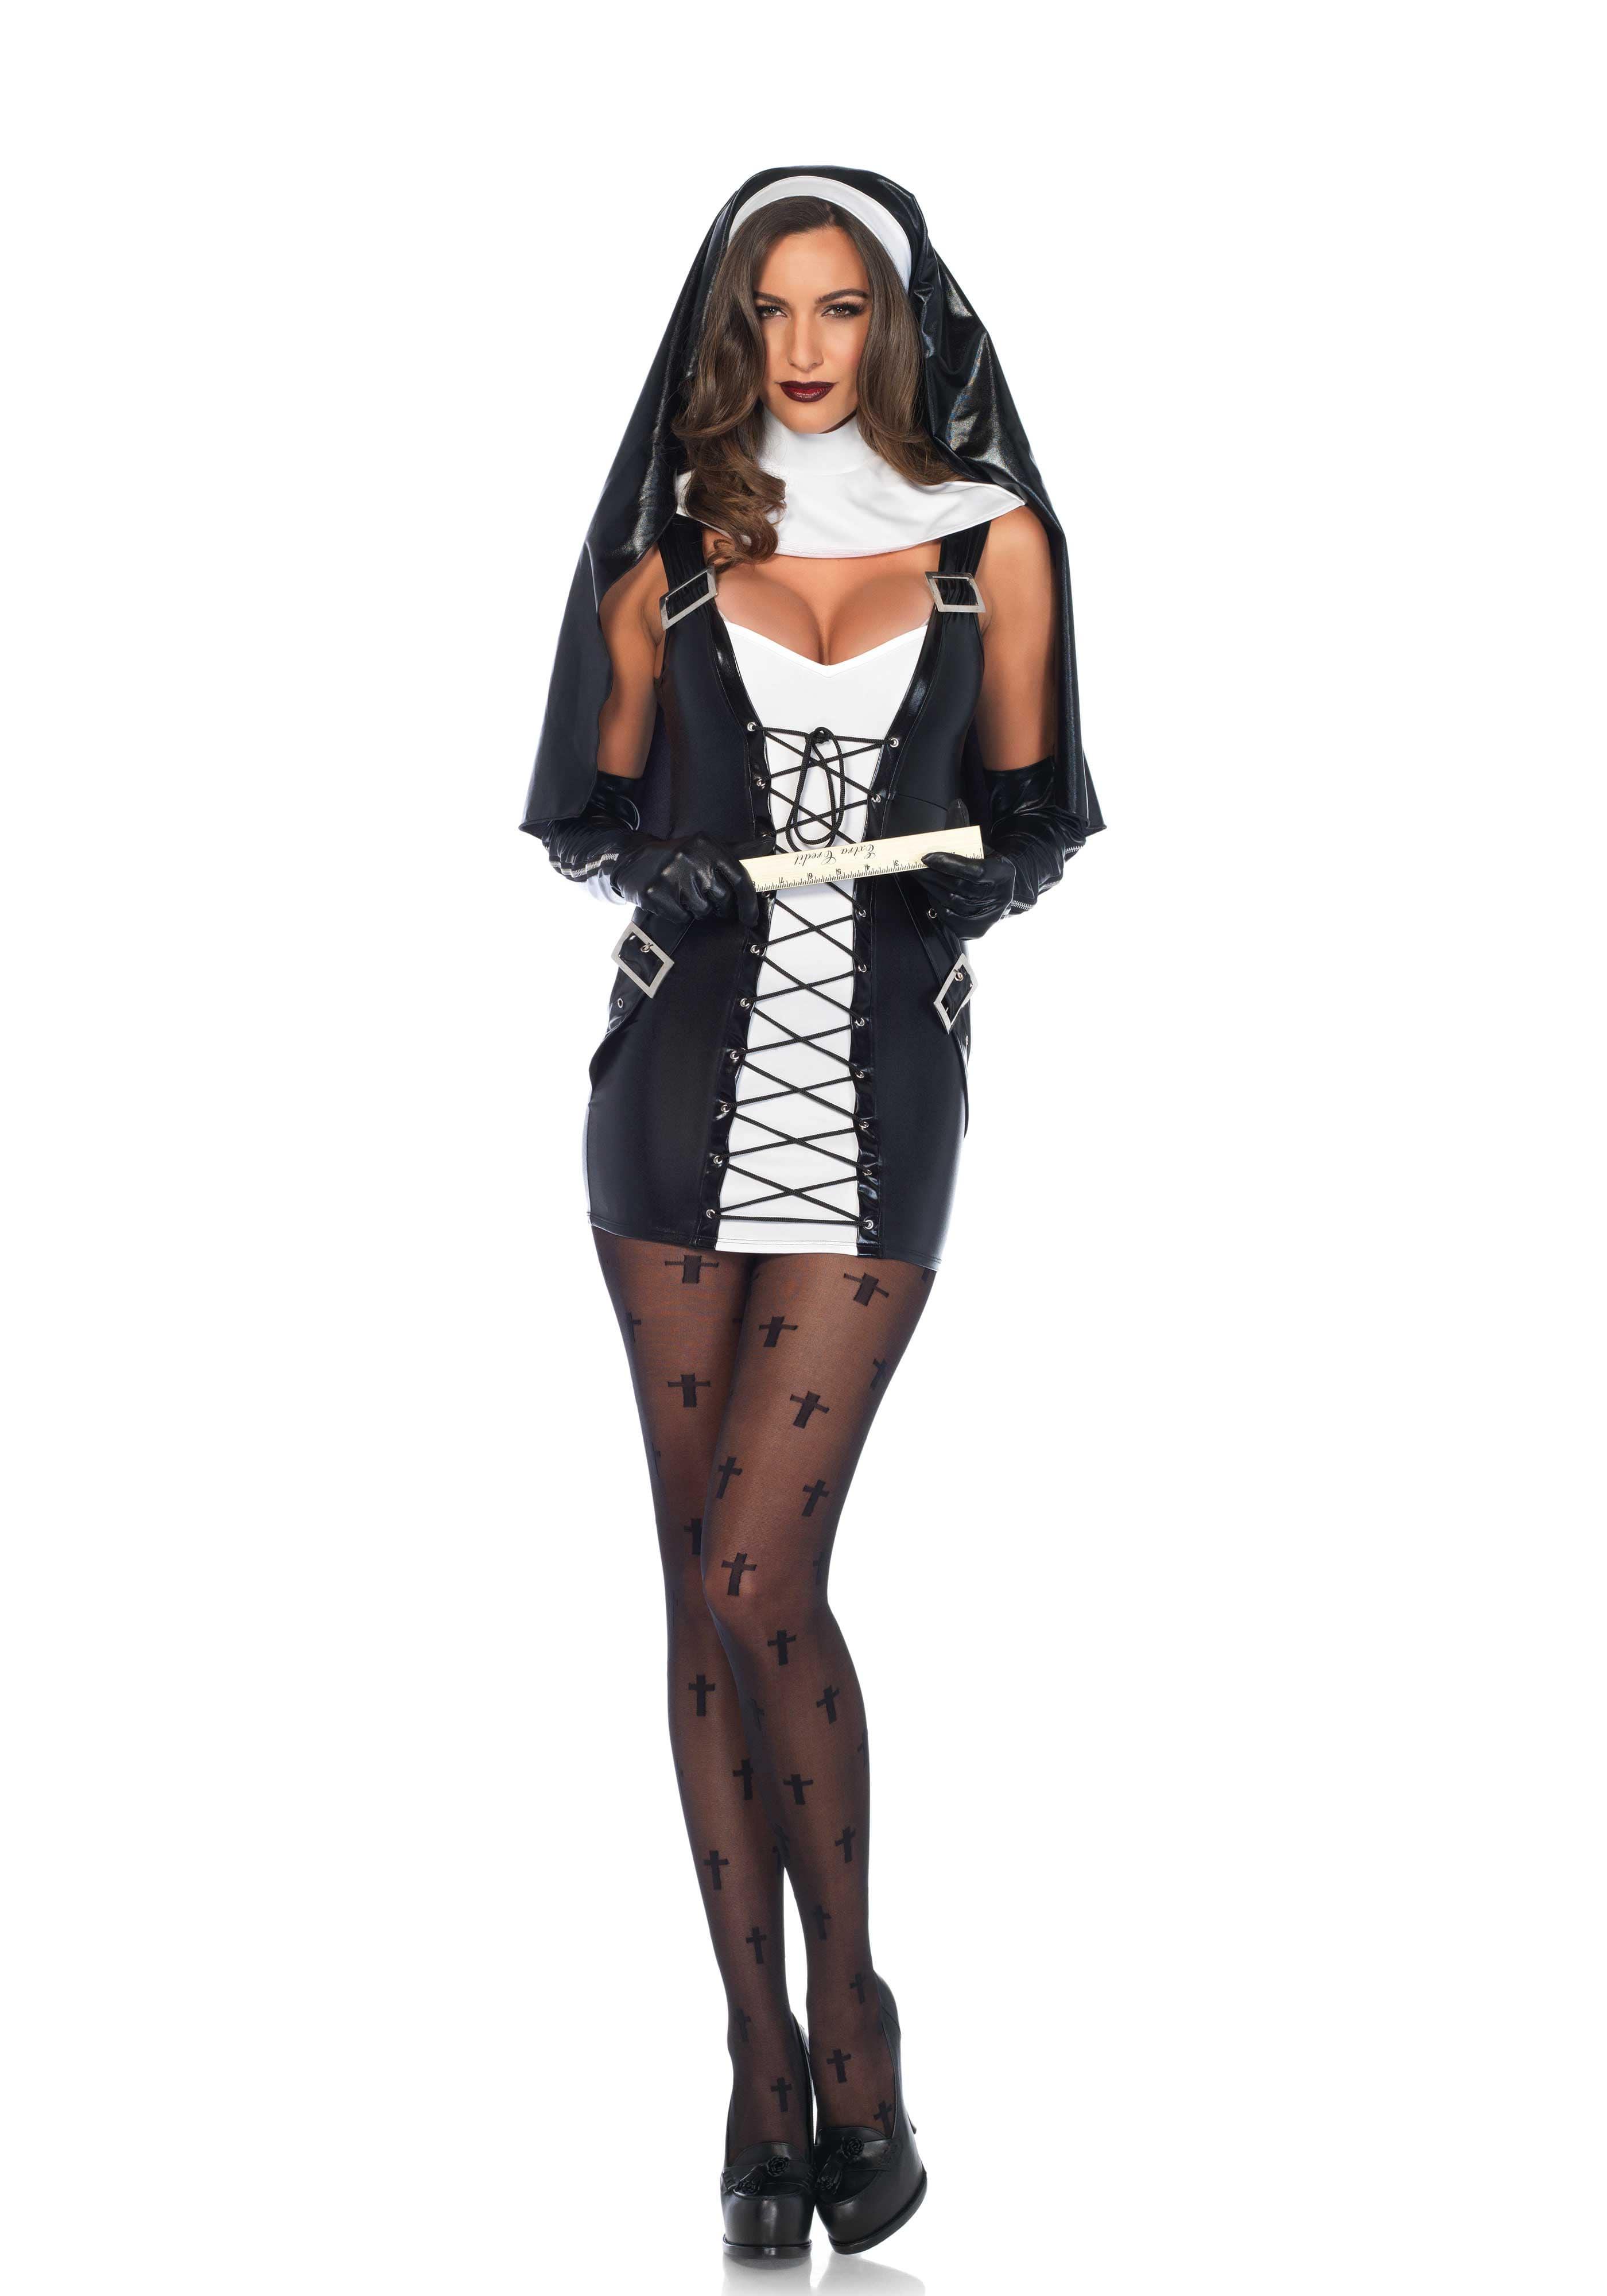 Zwart-Witte Sm Non Vrouw Kostuum